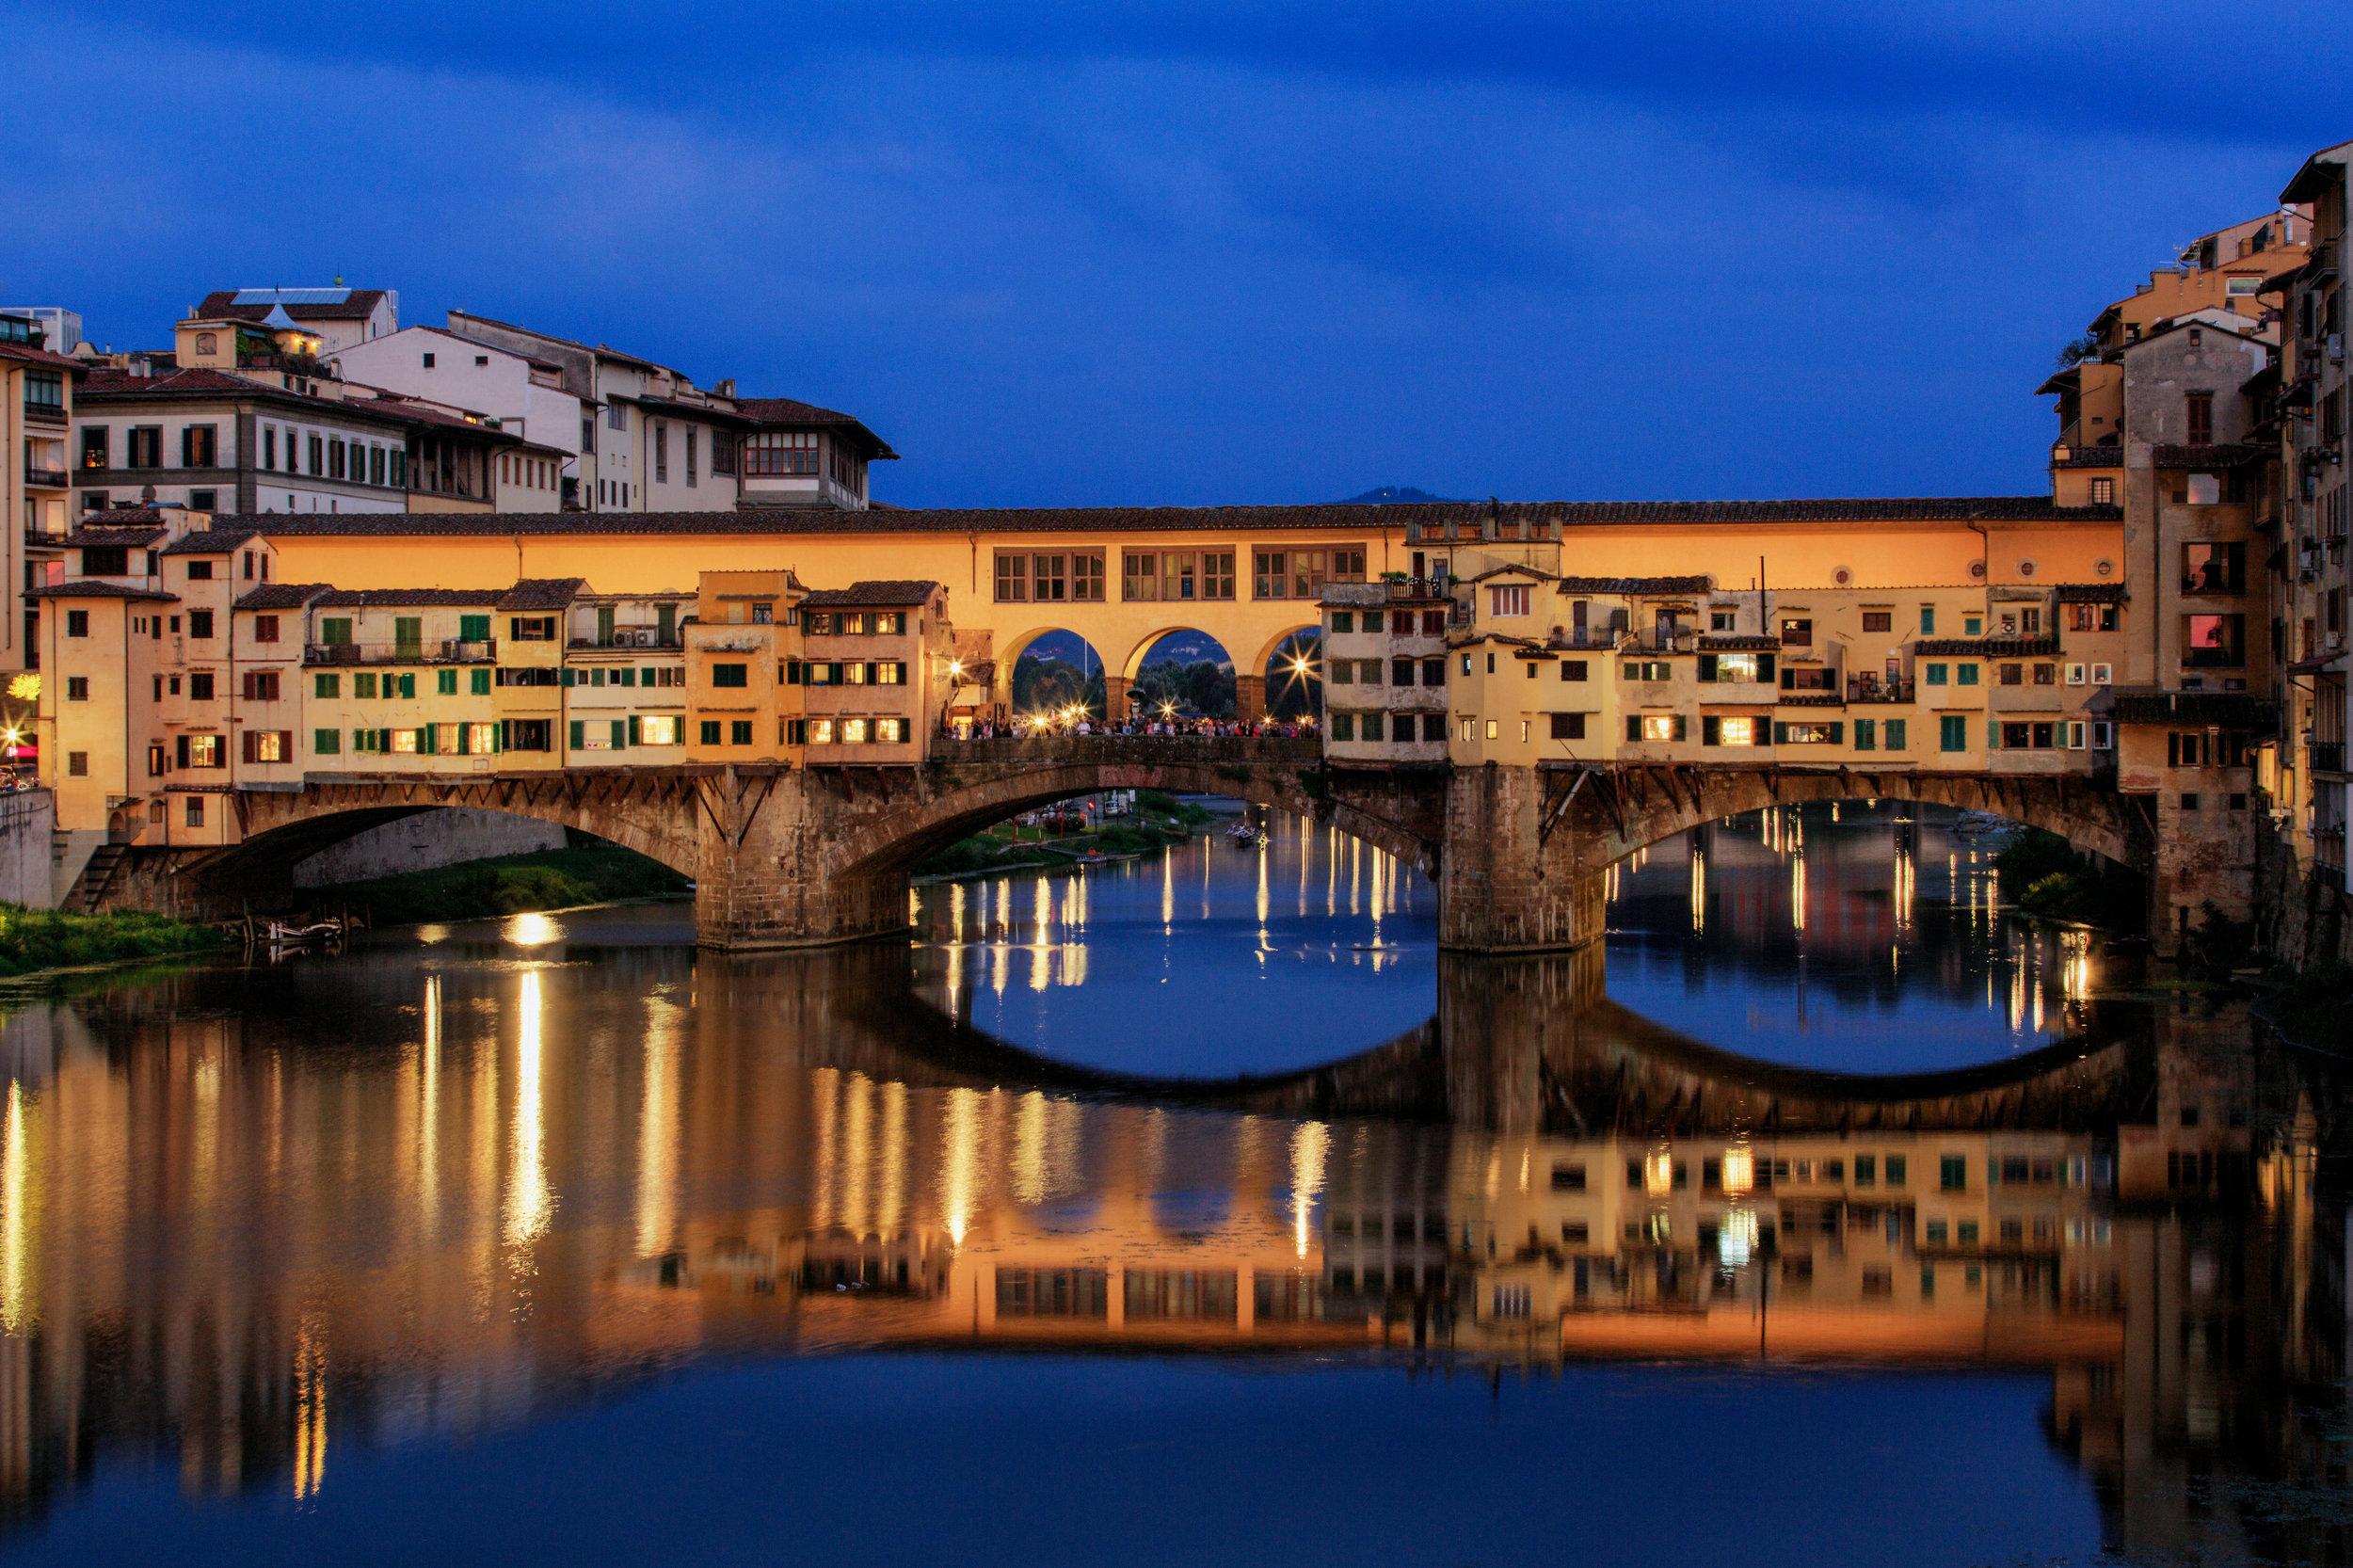 14 RFH Hotel Savoy - Ponte Vecchio 4394 JG Oct 16.JPG